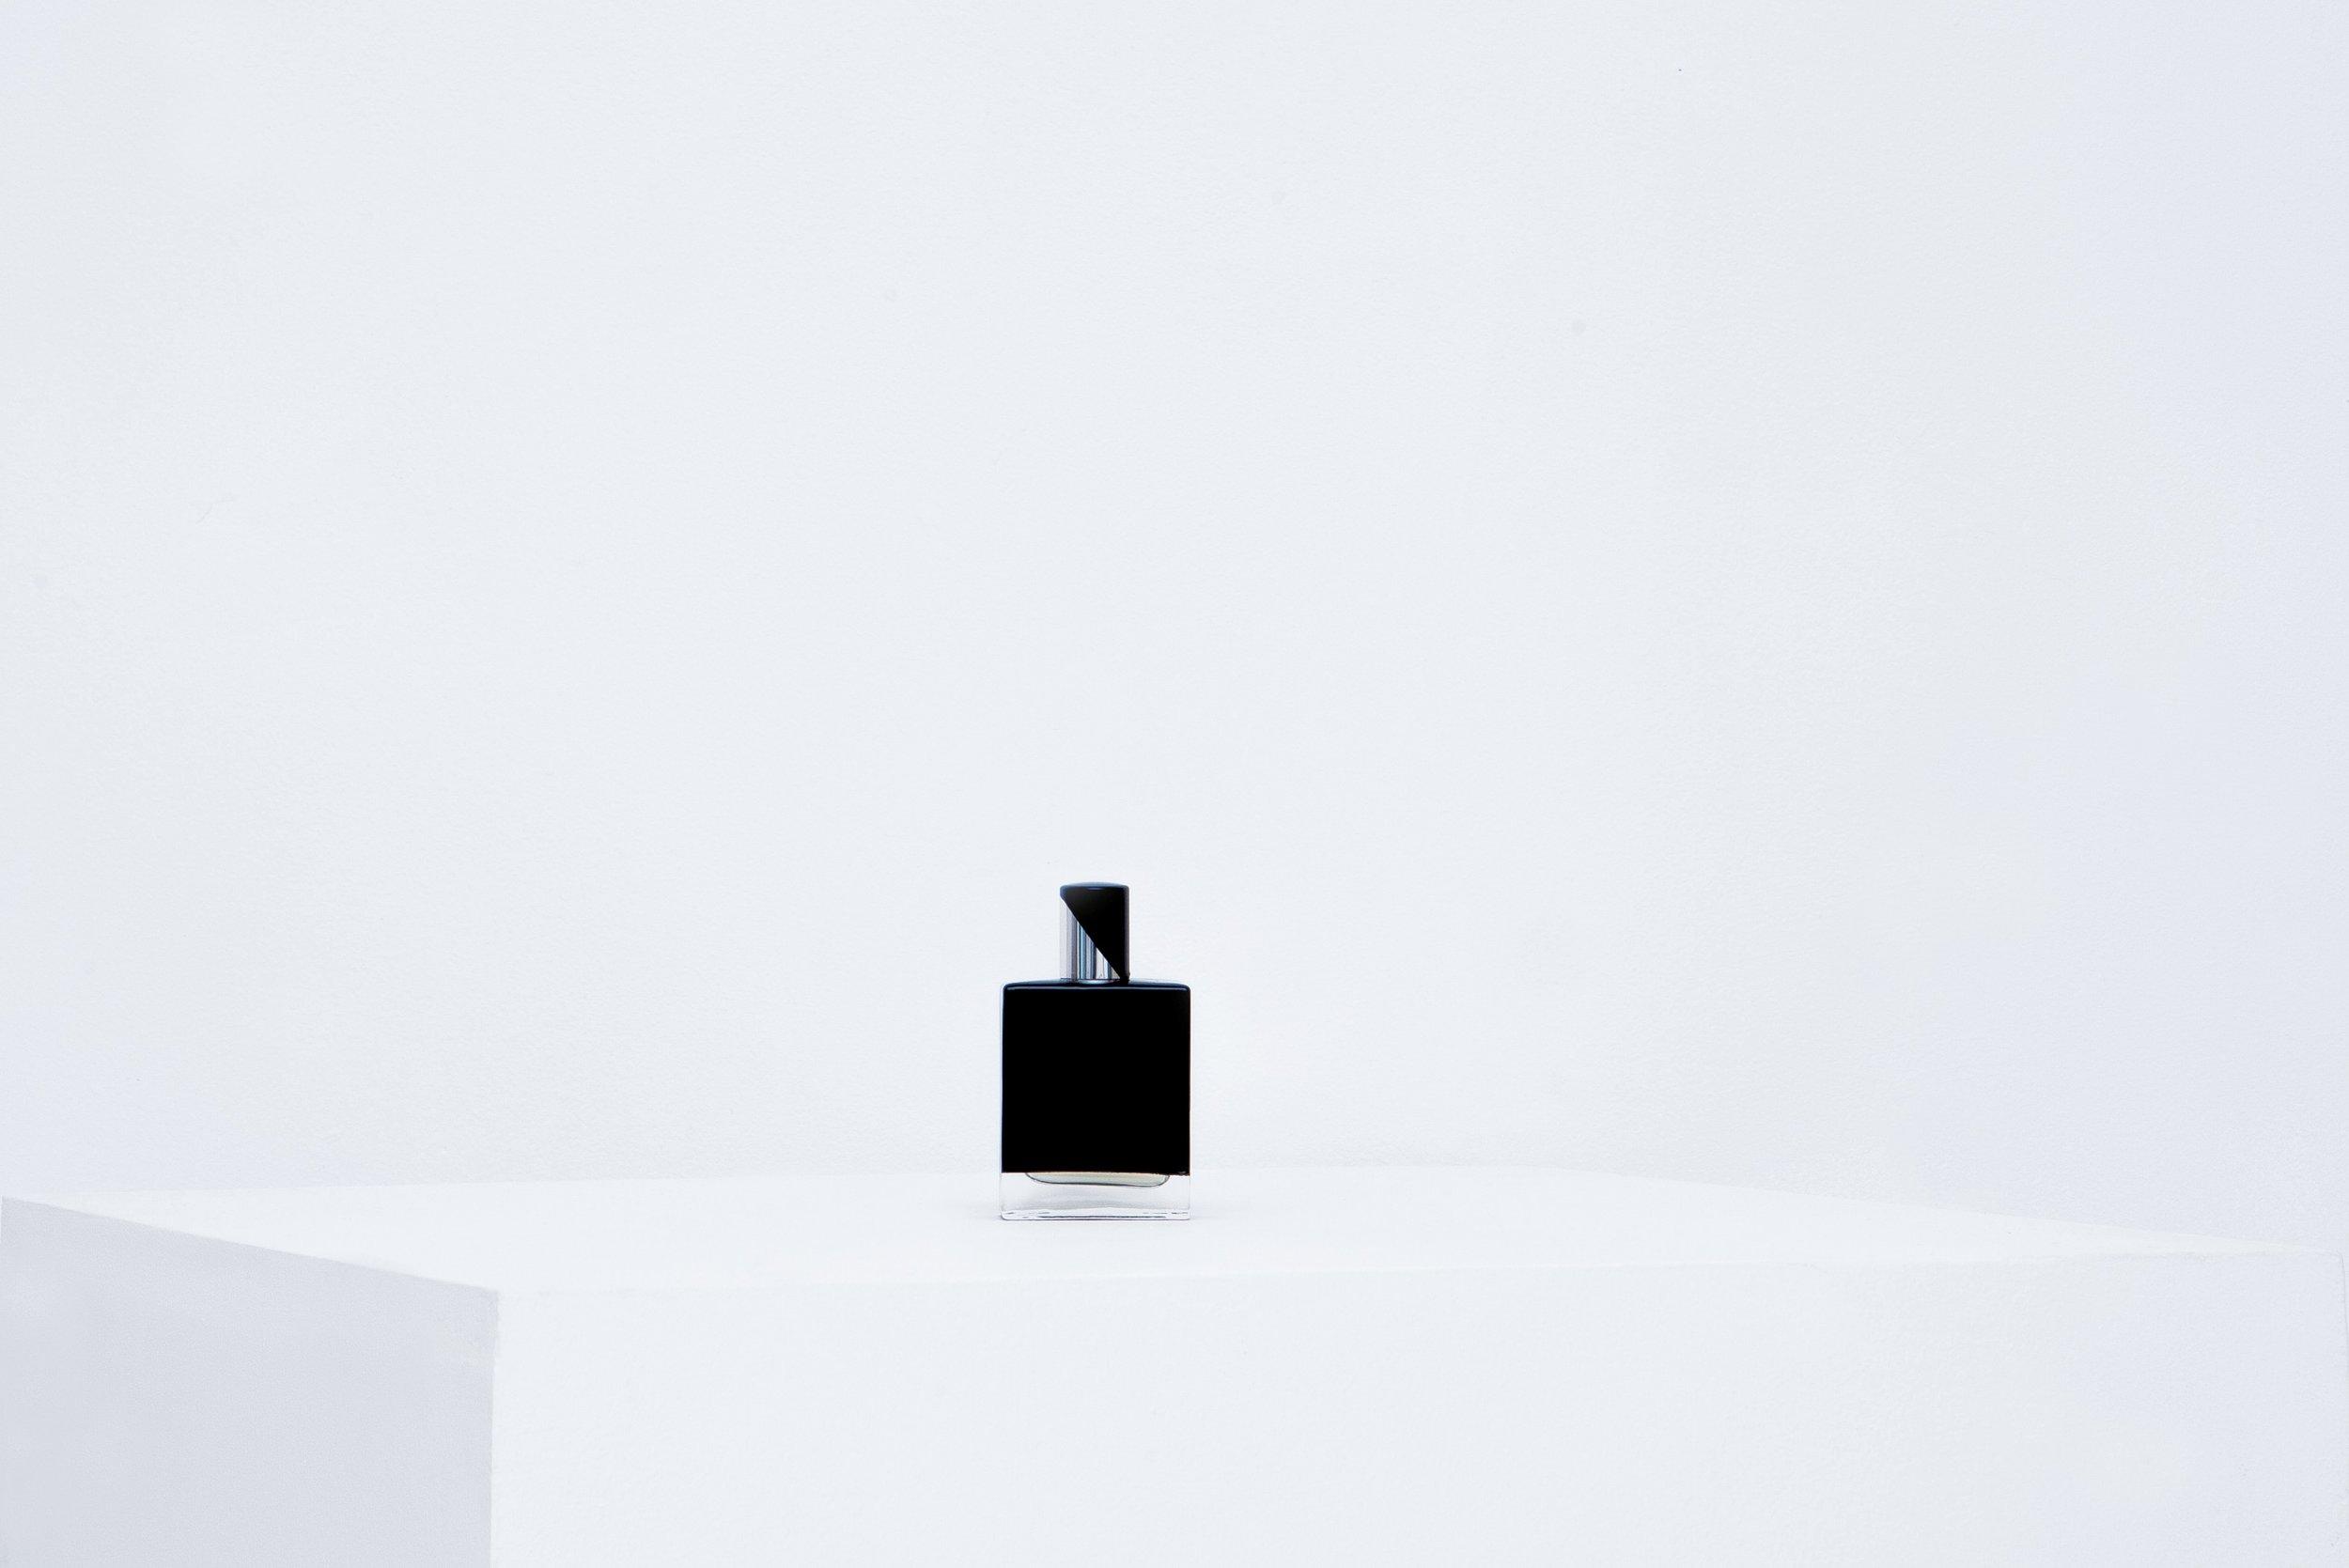 le-cinema-olfactif-la-hane-perfume-folie-a-plusieurs-parfums.JPG